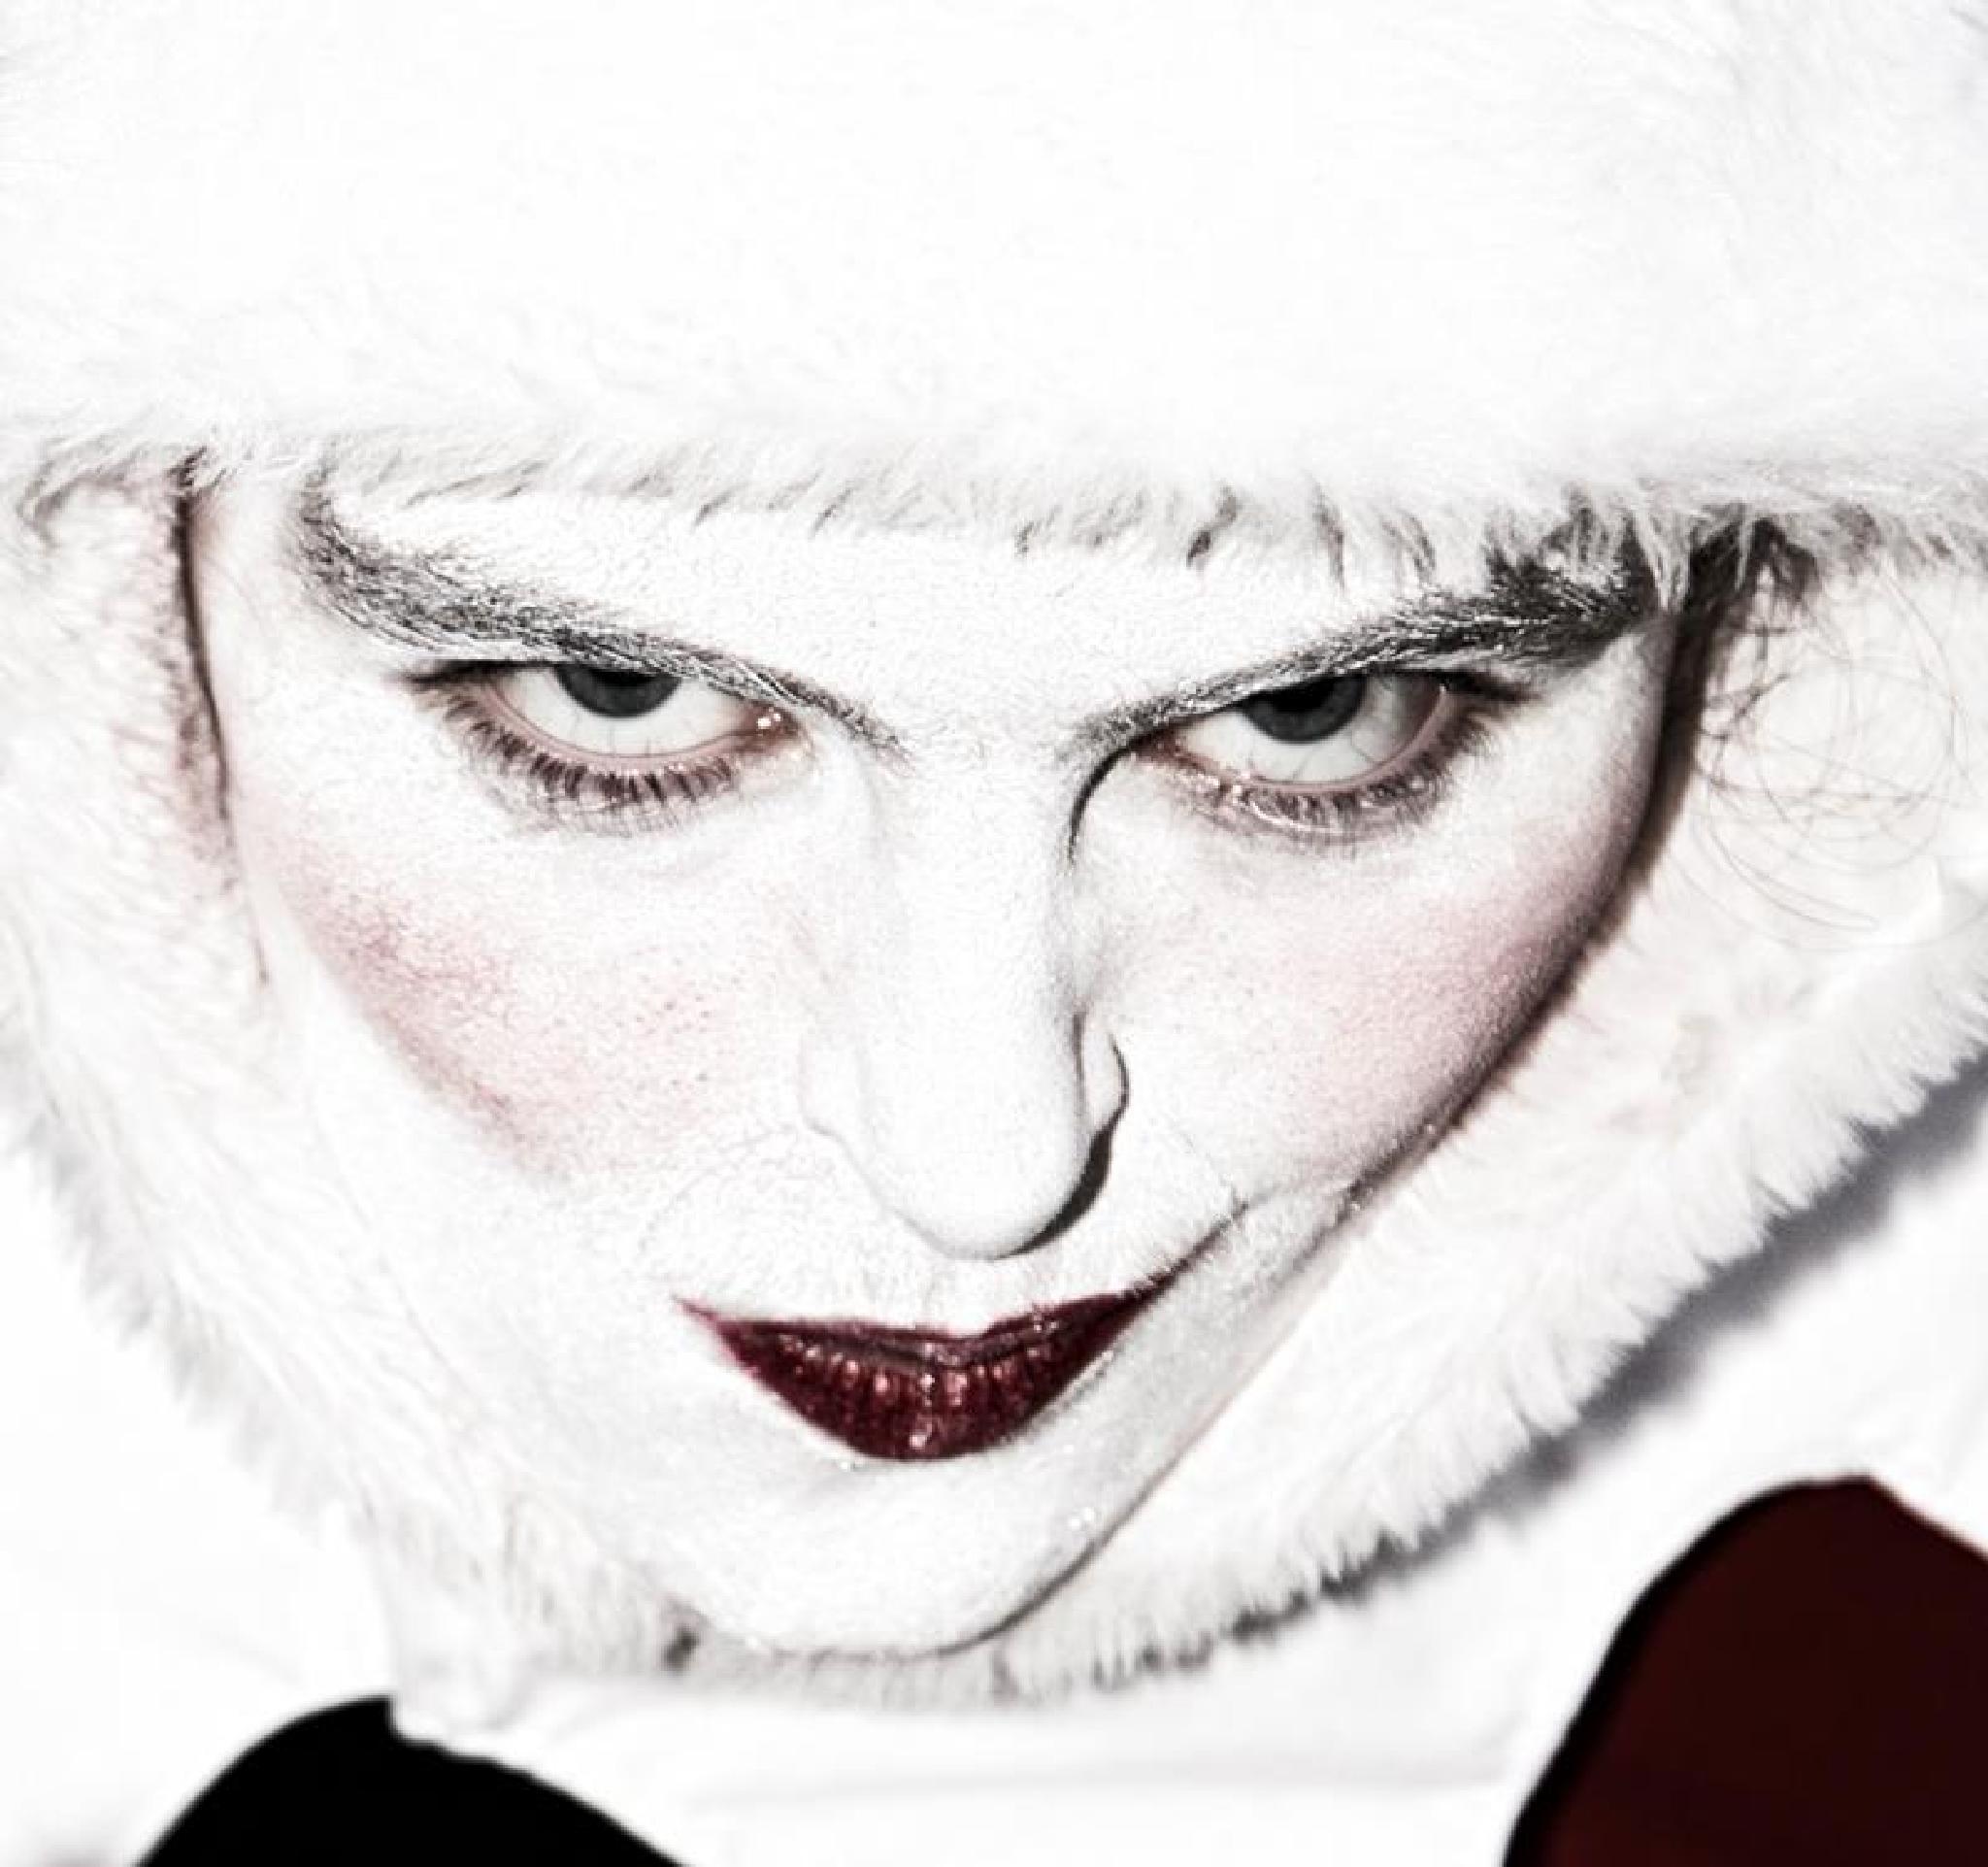 Harley Quinn by MarkCawley